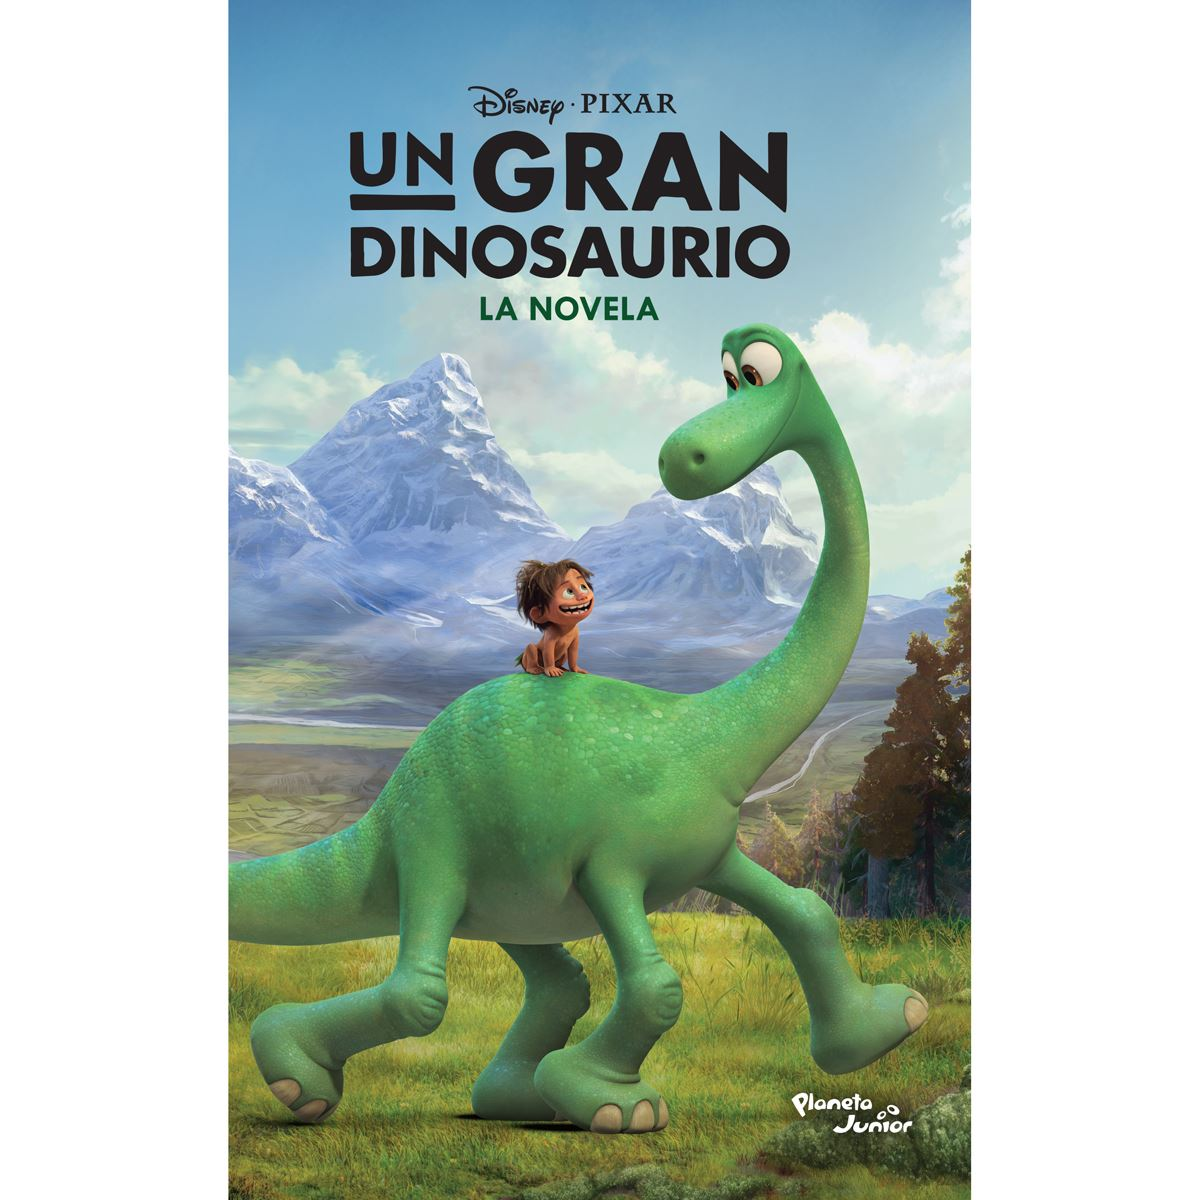 Un gran dinosaurio la novela